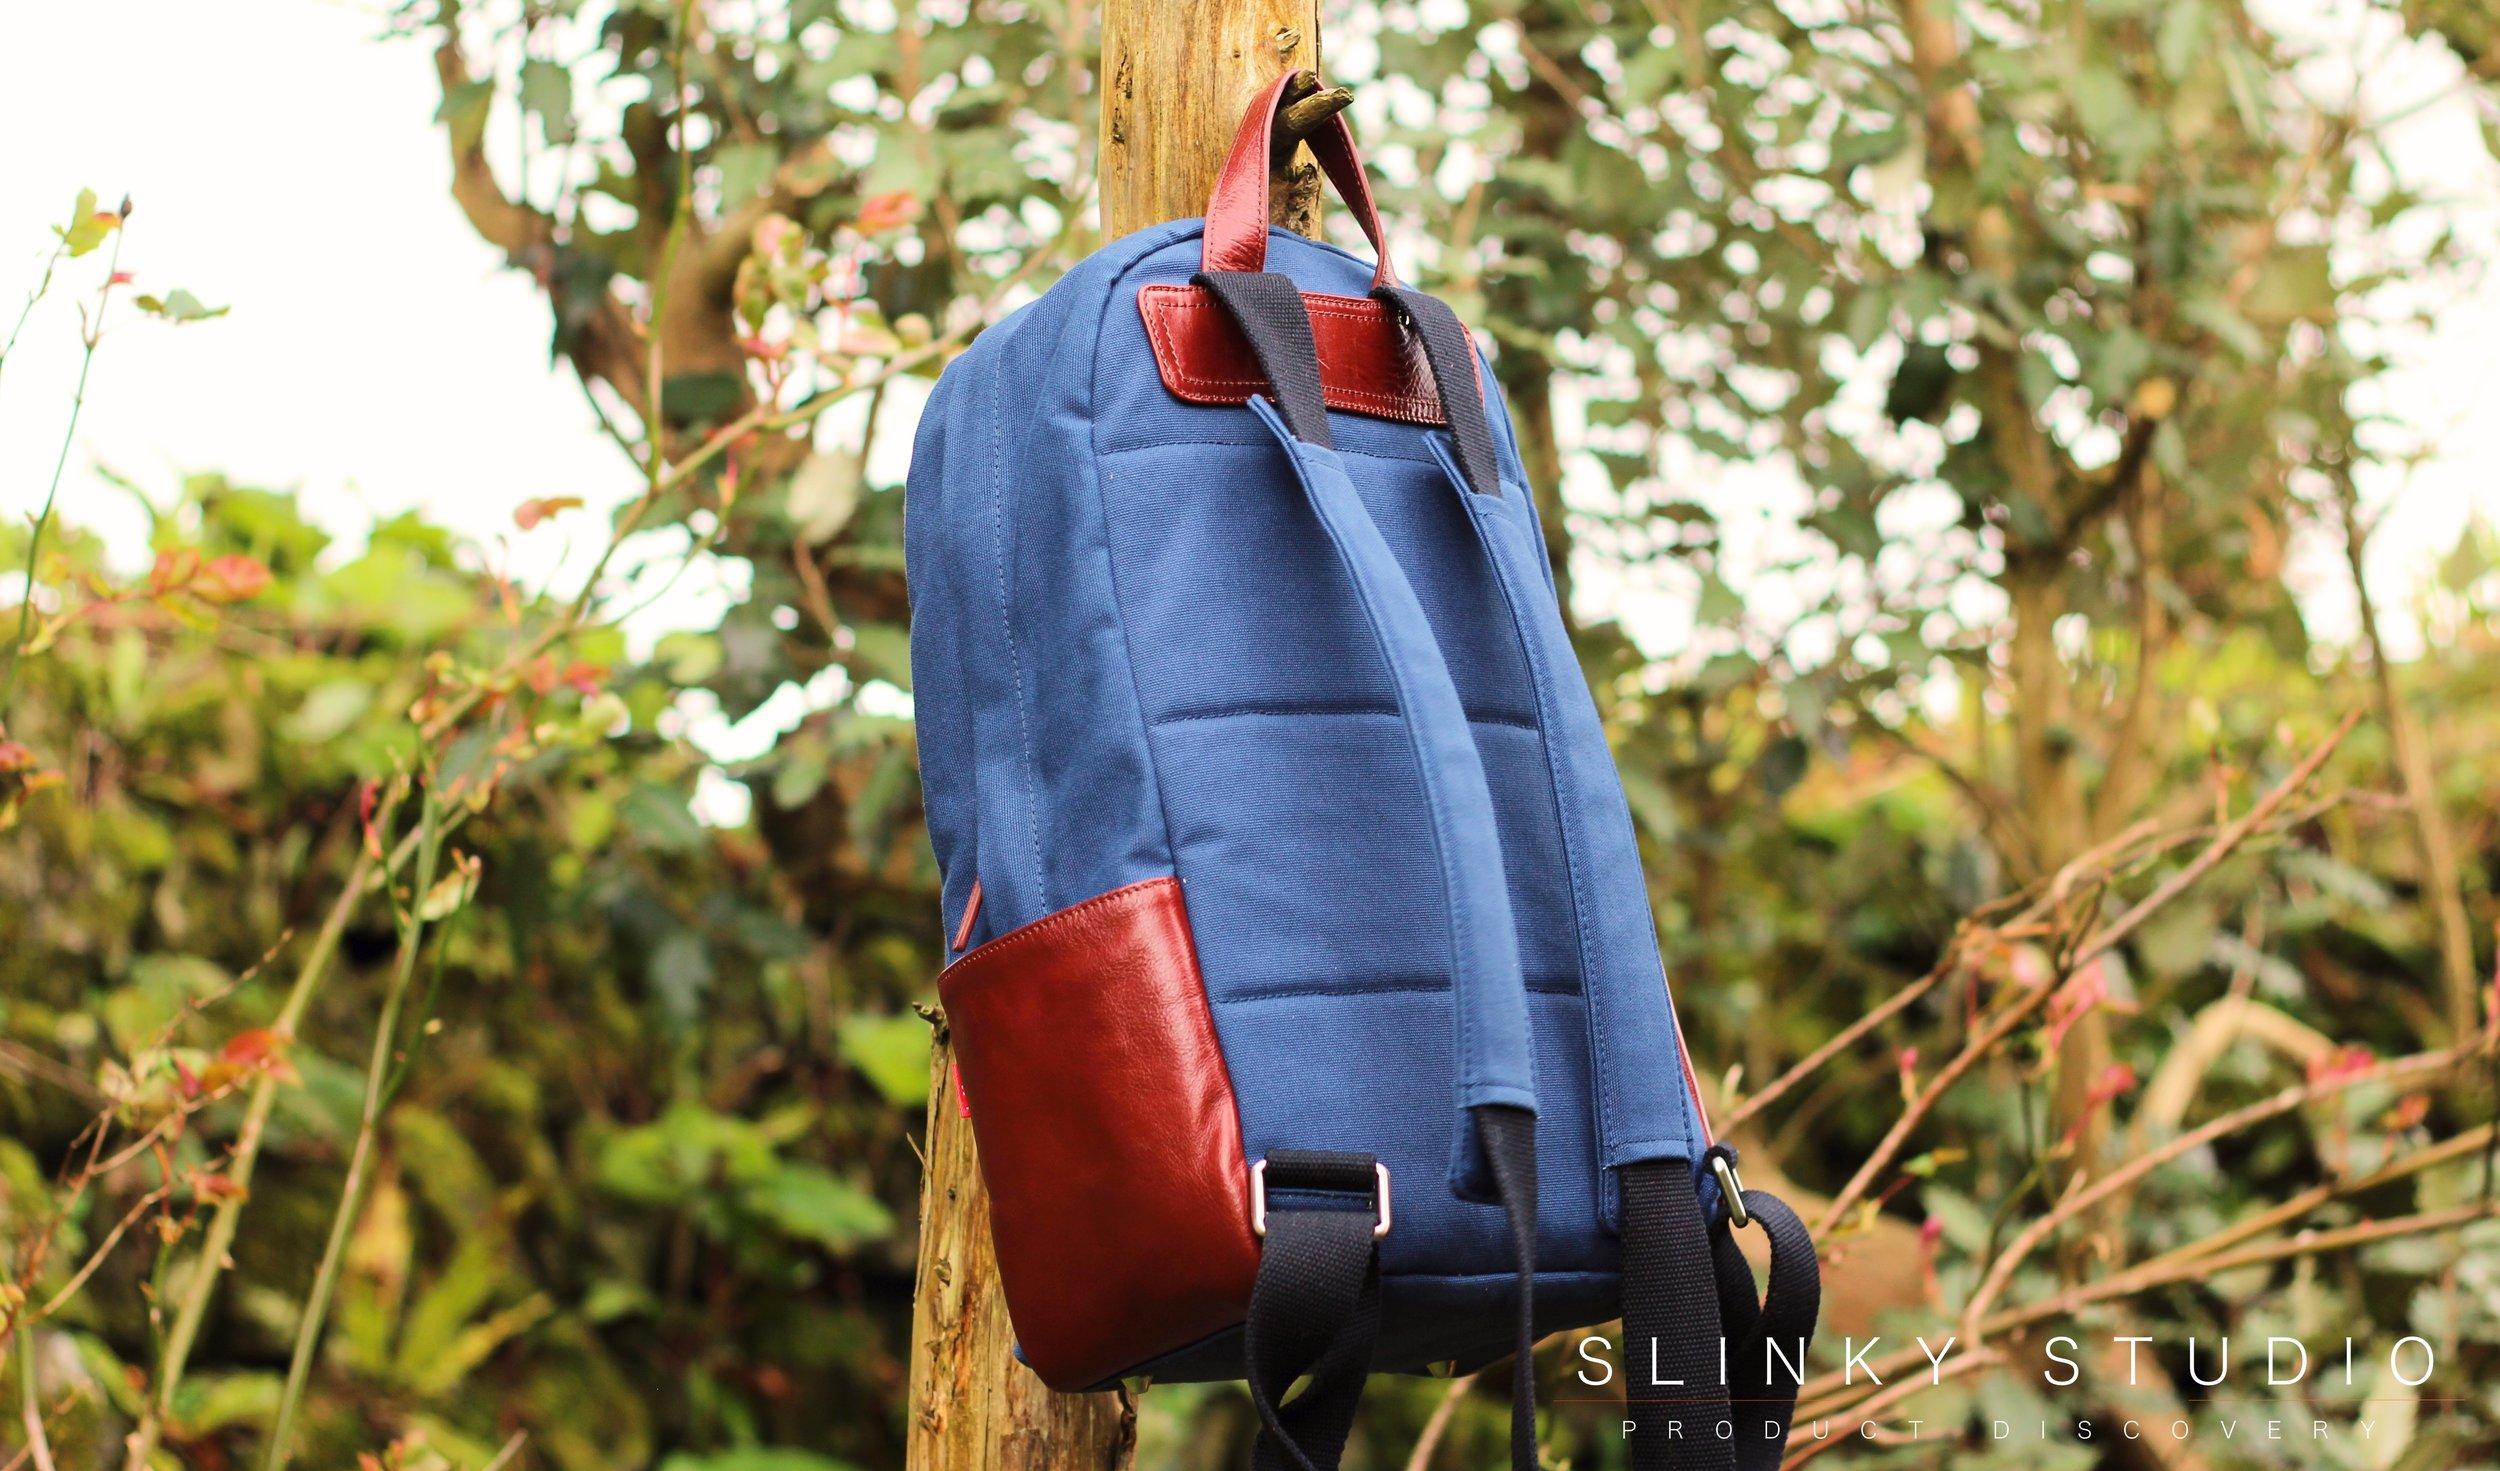 Toffee Berlin Backpack hanging from Tree Branch Adjustable Shoulder Straps Navy Blue.jpg